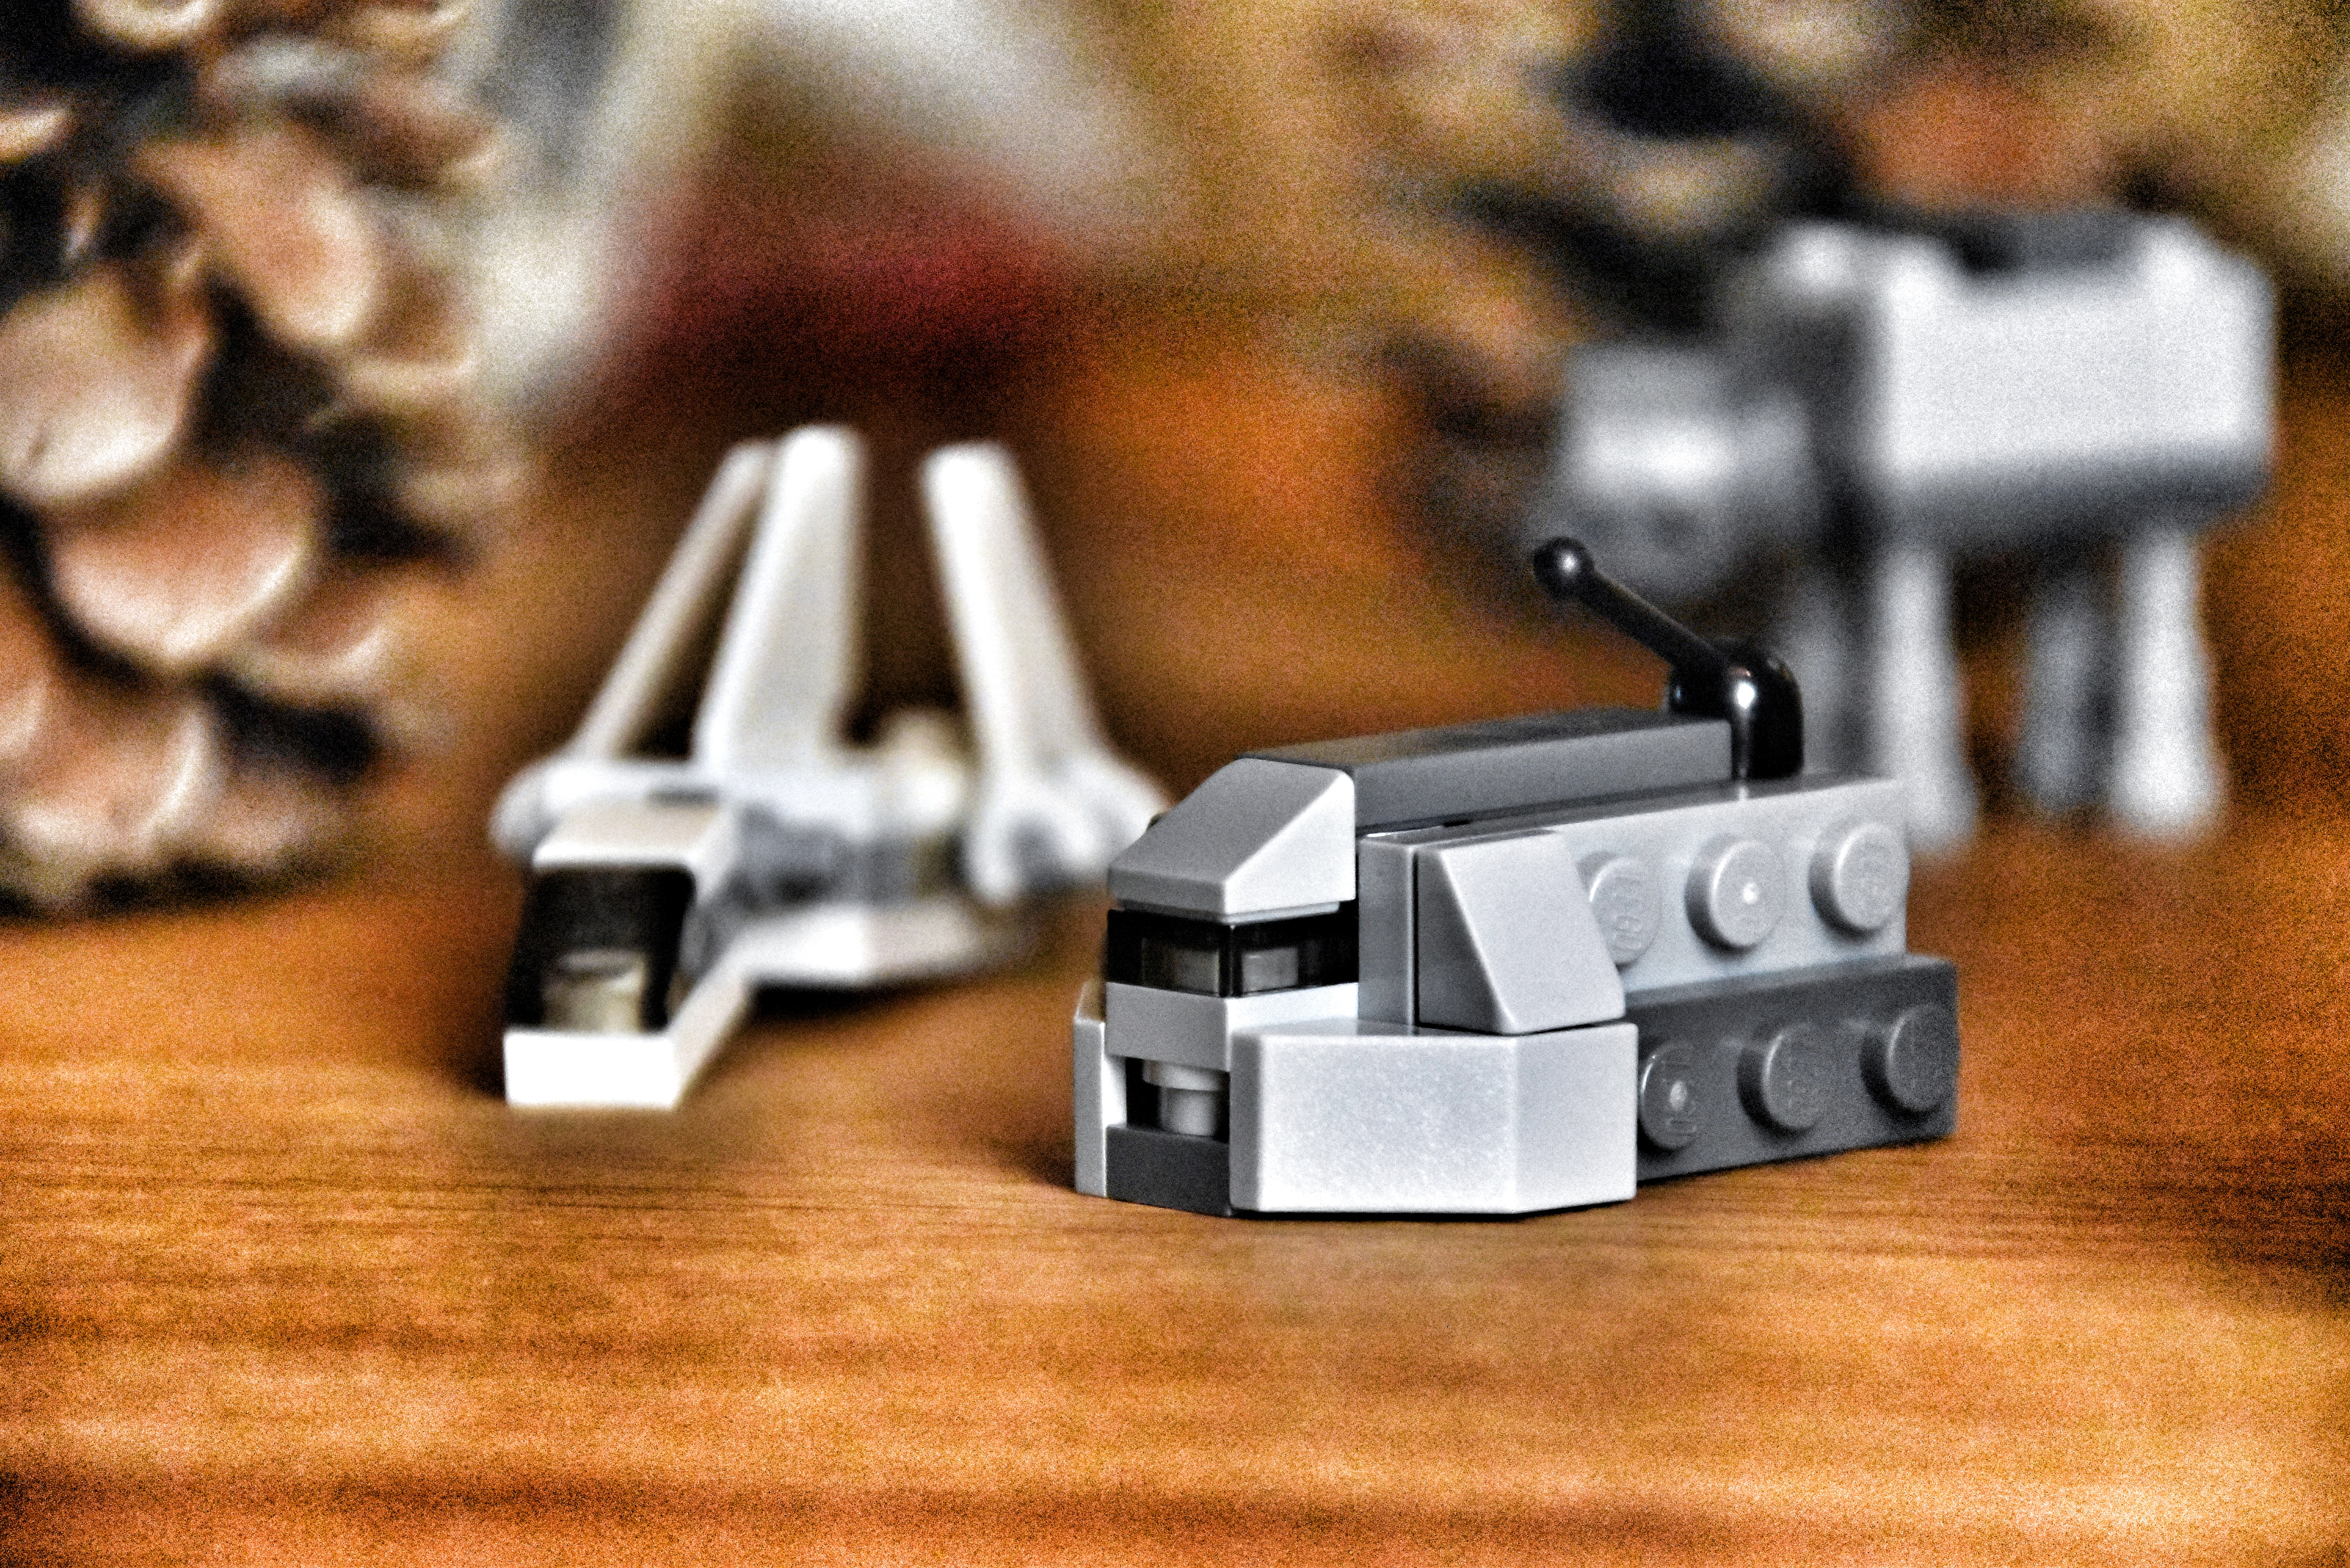 Lego Reconnaisance Troop Transporter